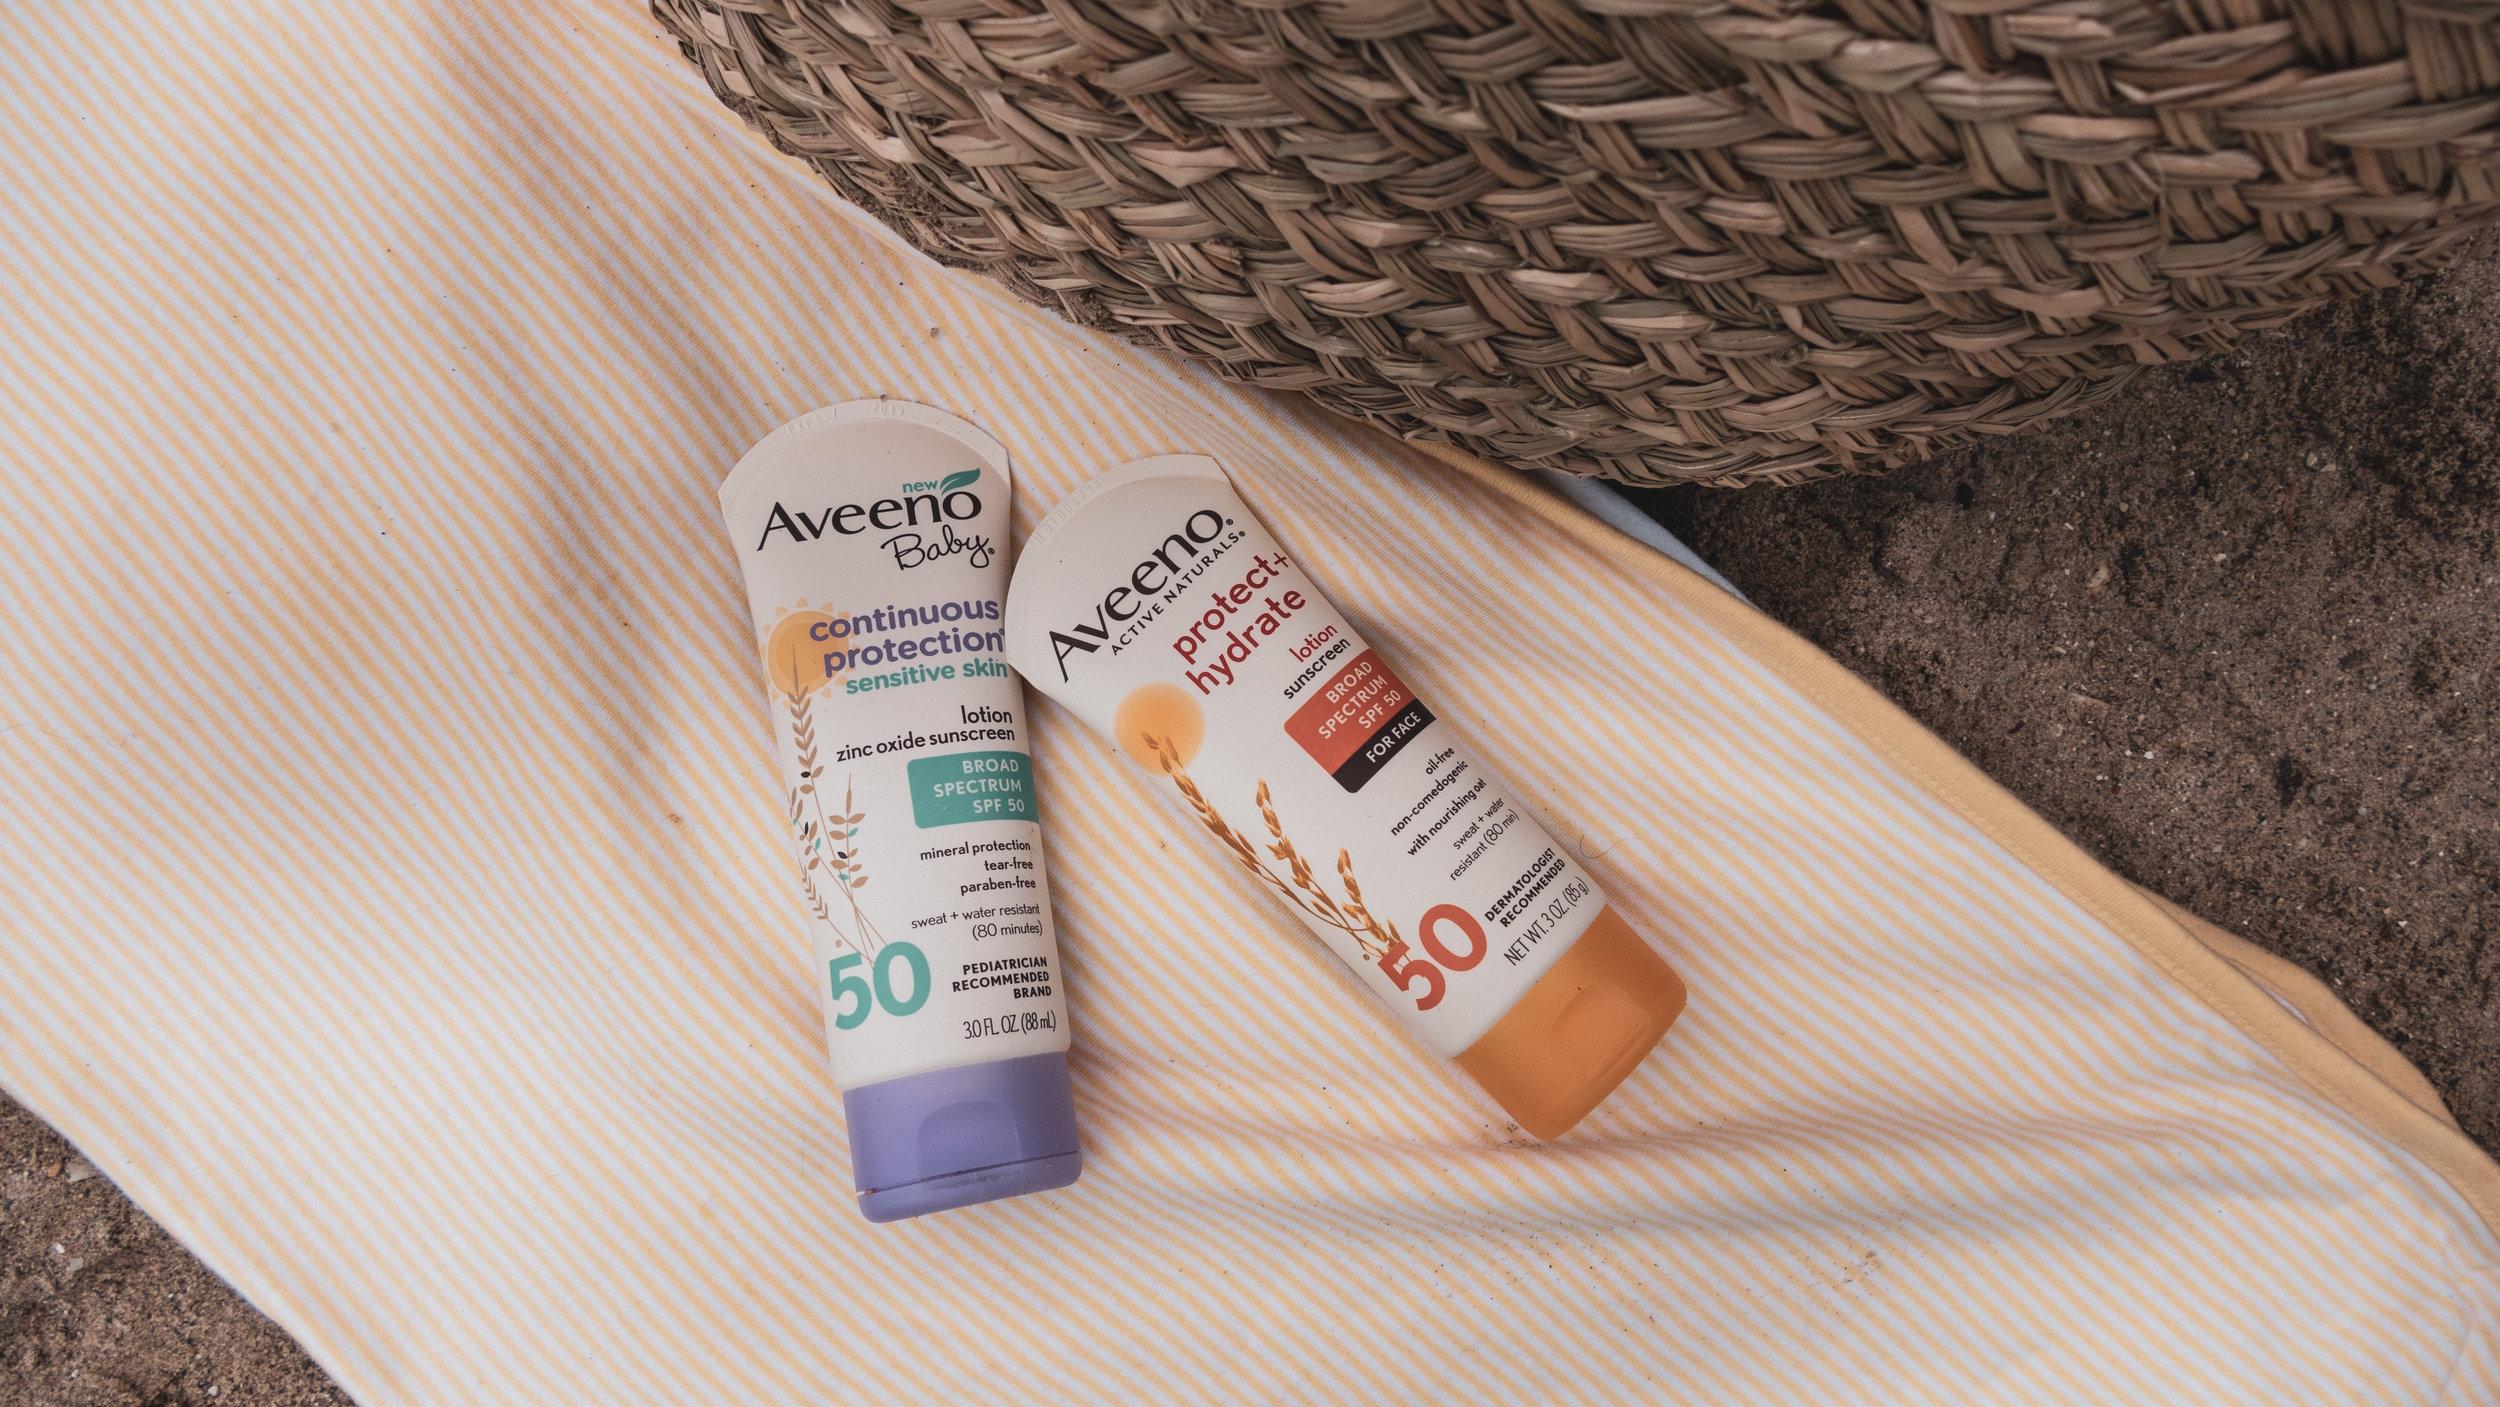 skin care,aveeno skincare,skin care routine, skin products, skin care regimen, aveeno spf, sensitive skin